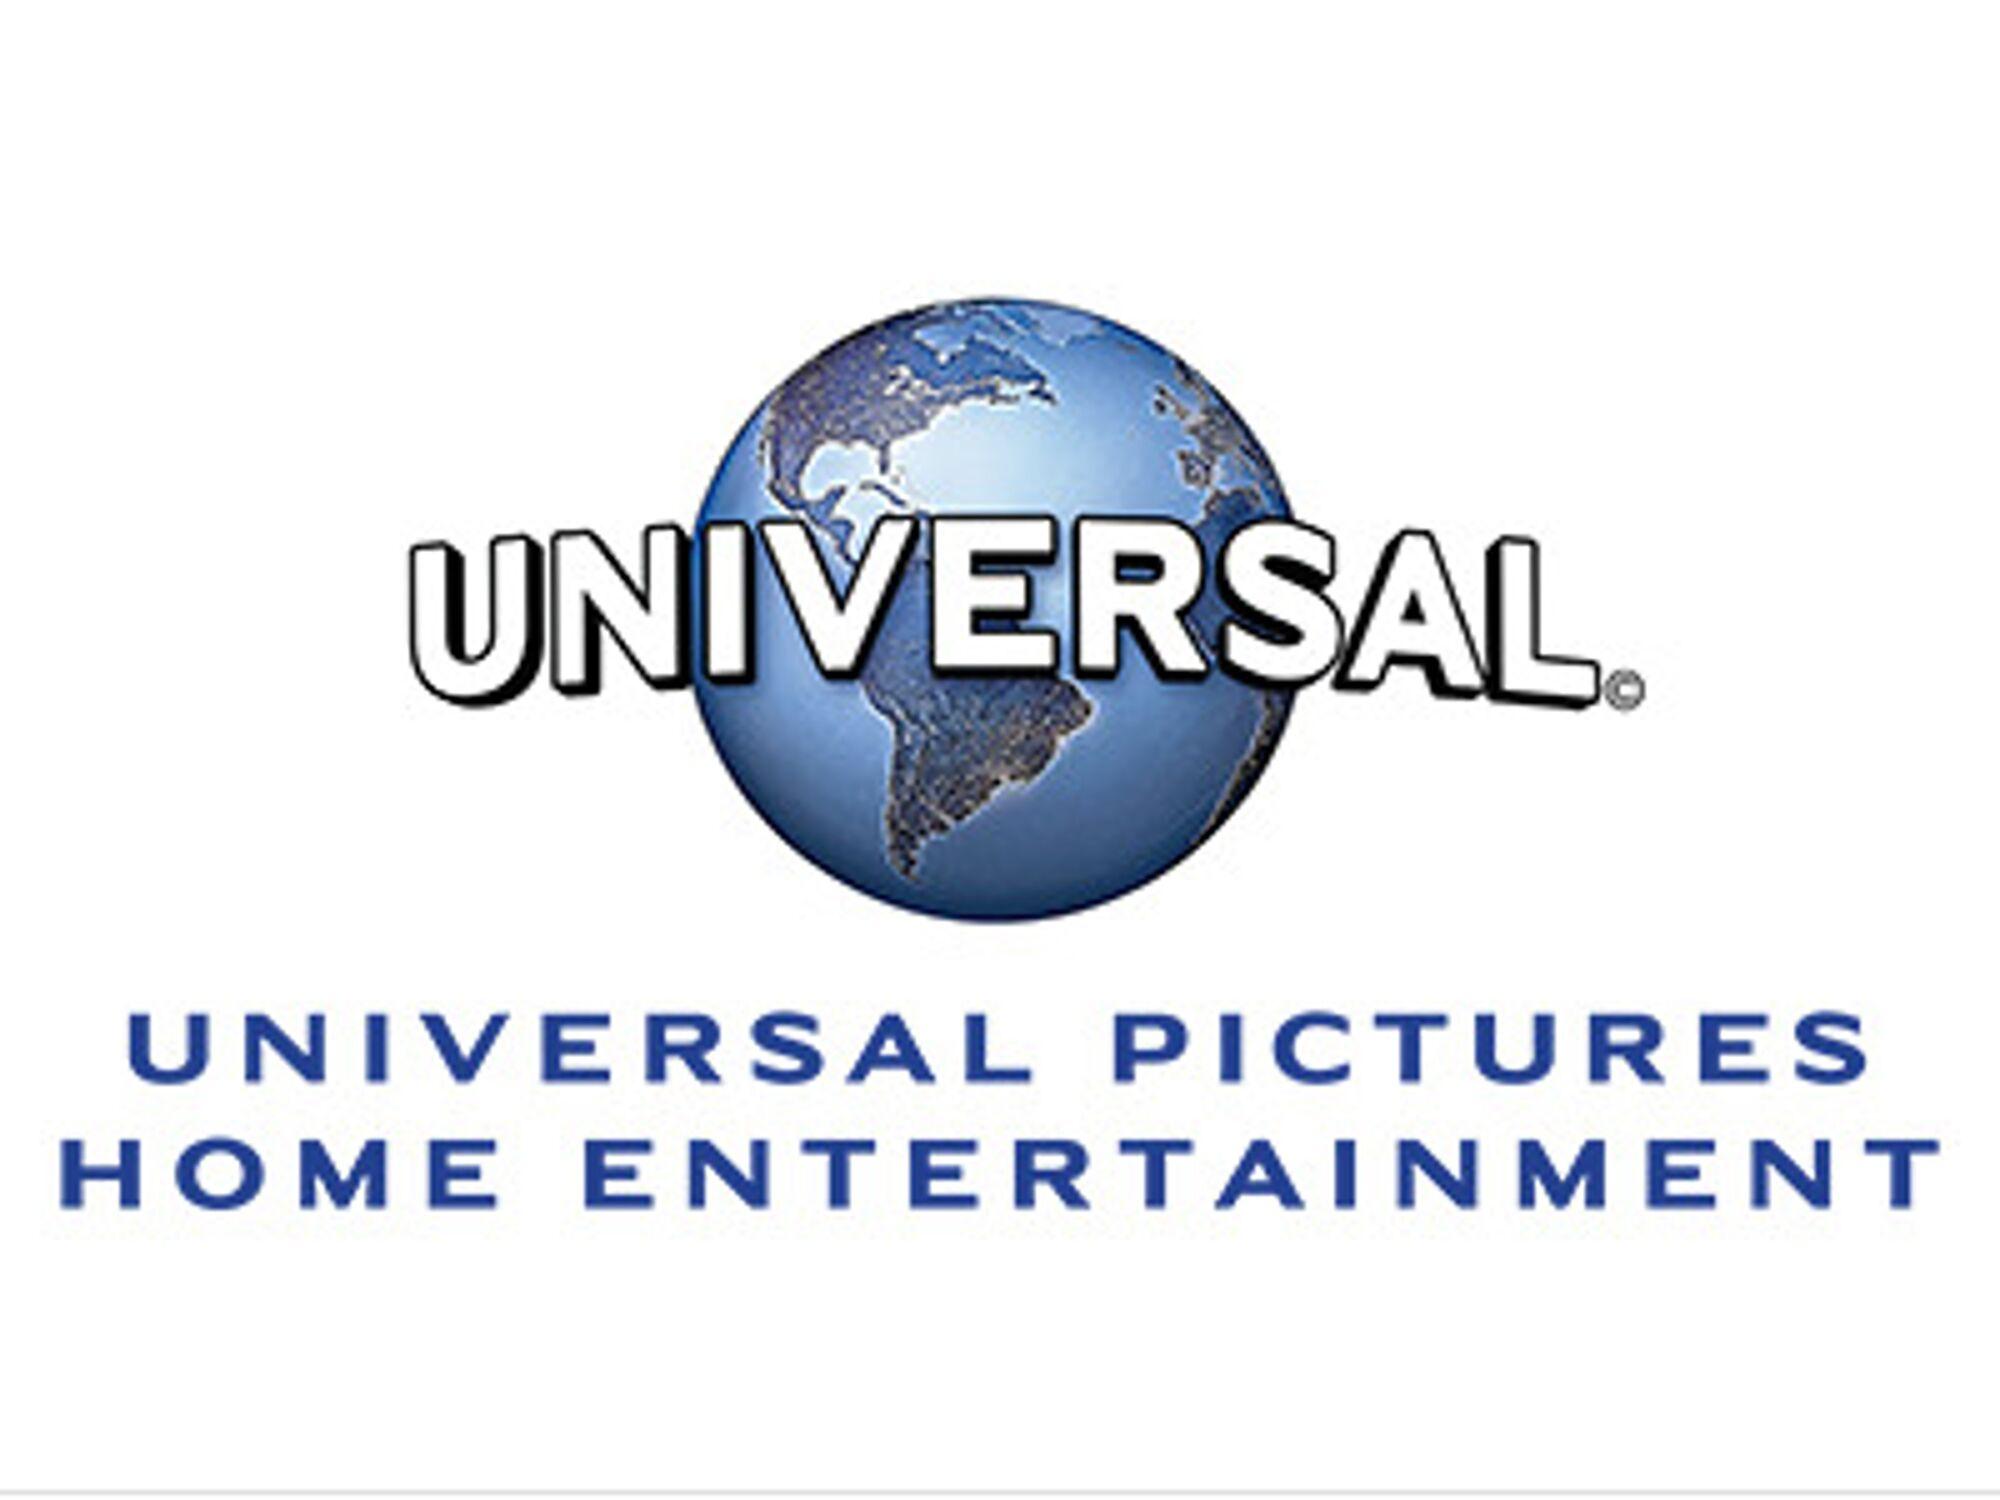 Universal Pictures Home Entertainment Casper The Friendly